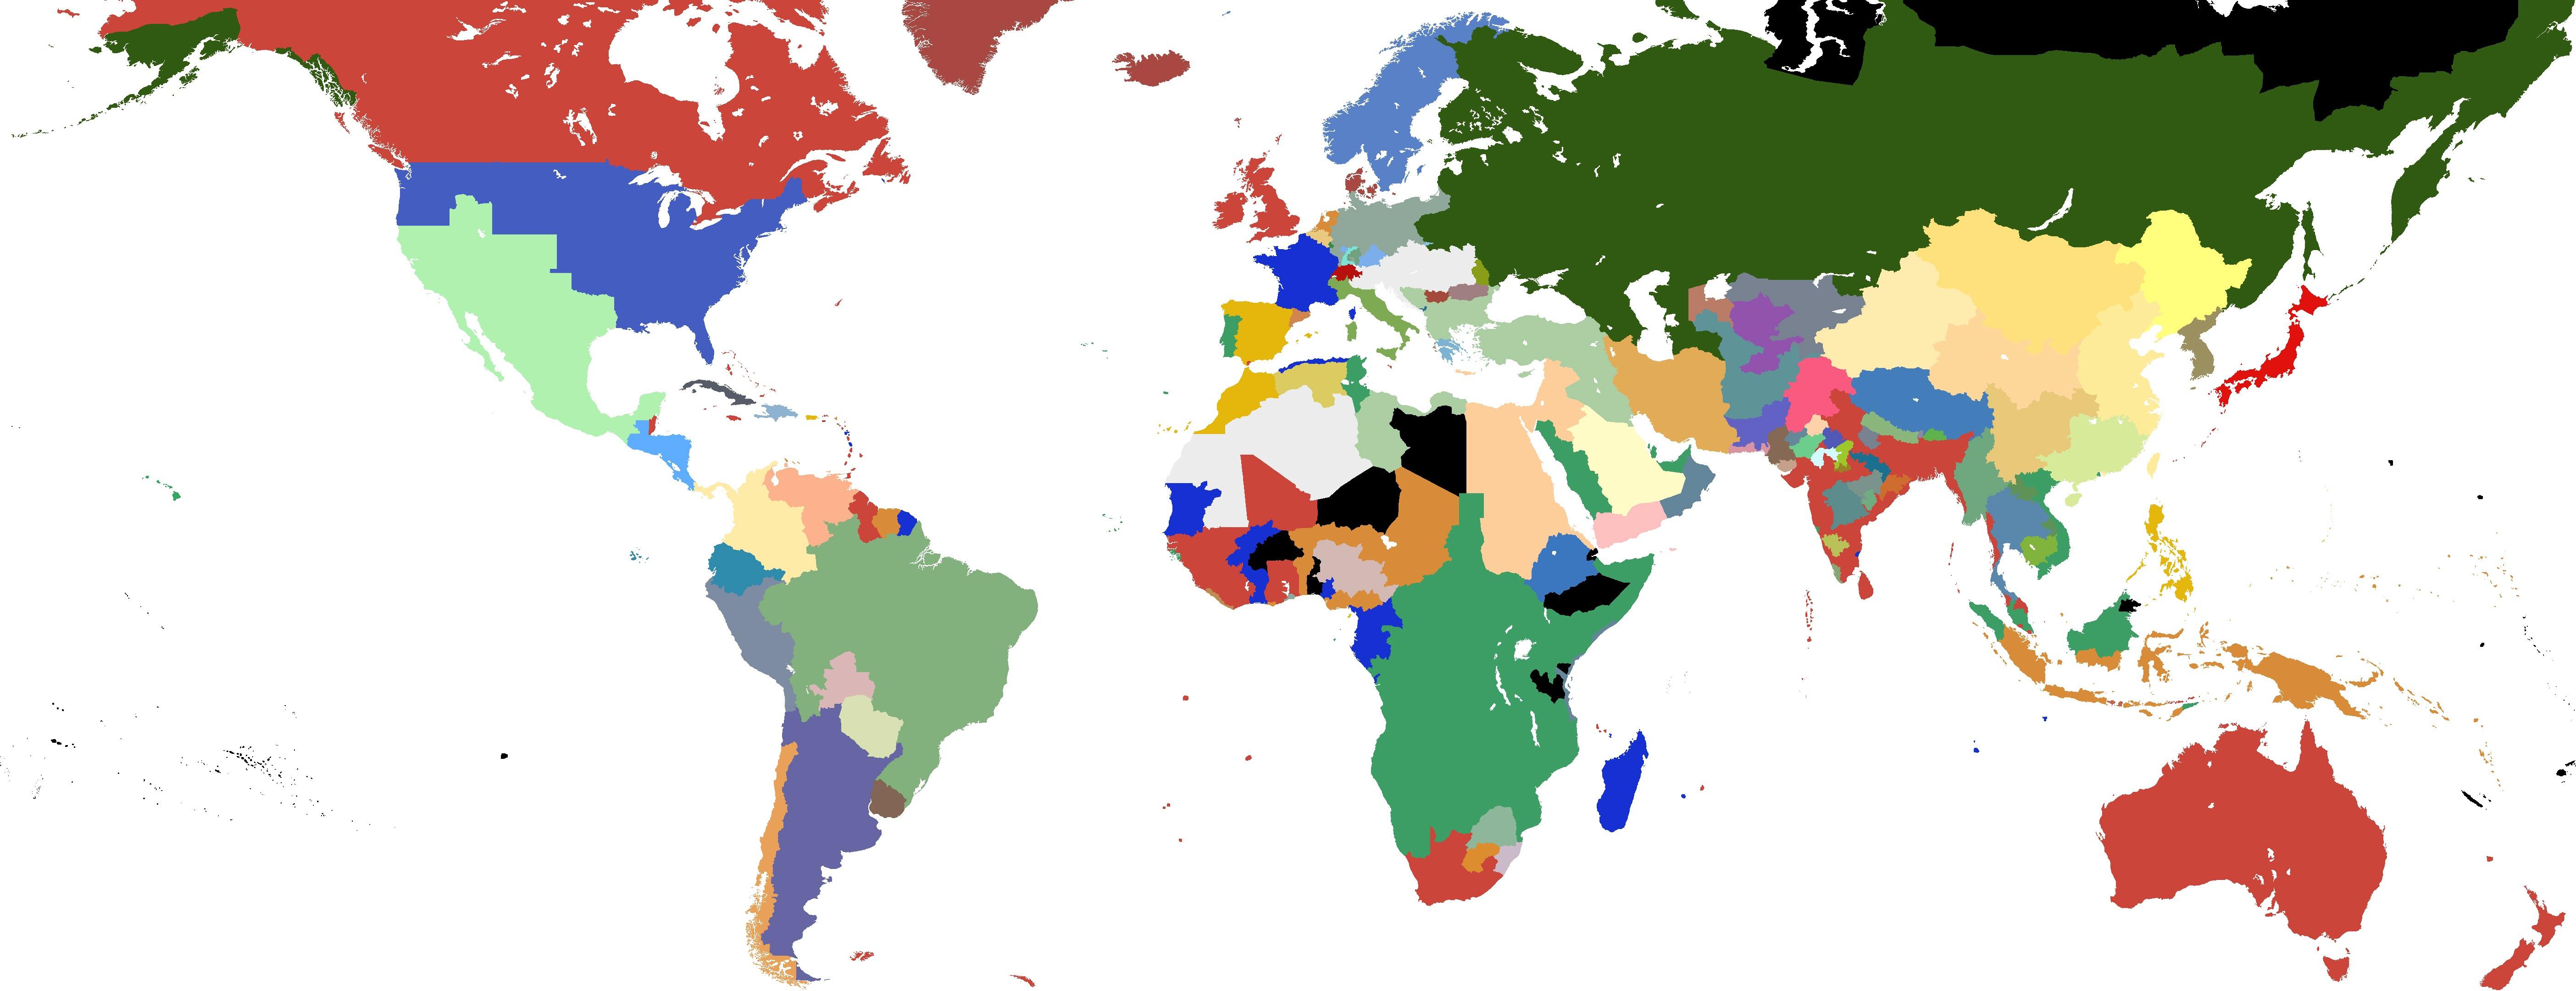 V2_MAP_POR_1881.1.1_5.jpg